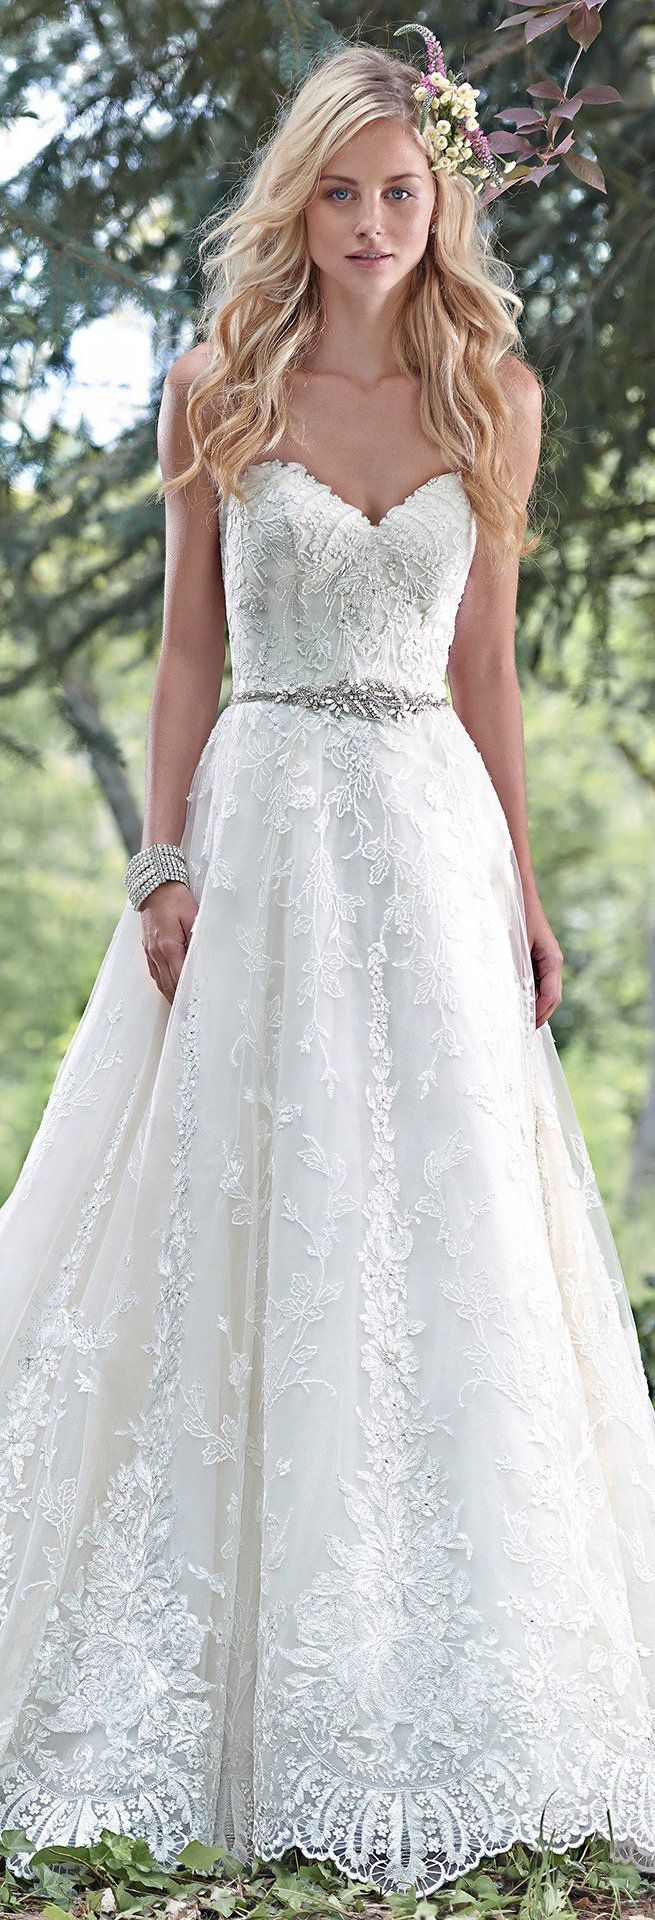 luna novias wedding gowns halloween wedding dresses Maggie Sottero Wedding Dresses